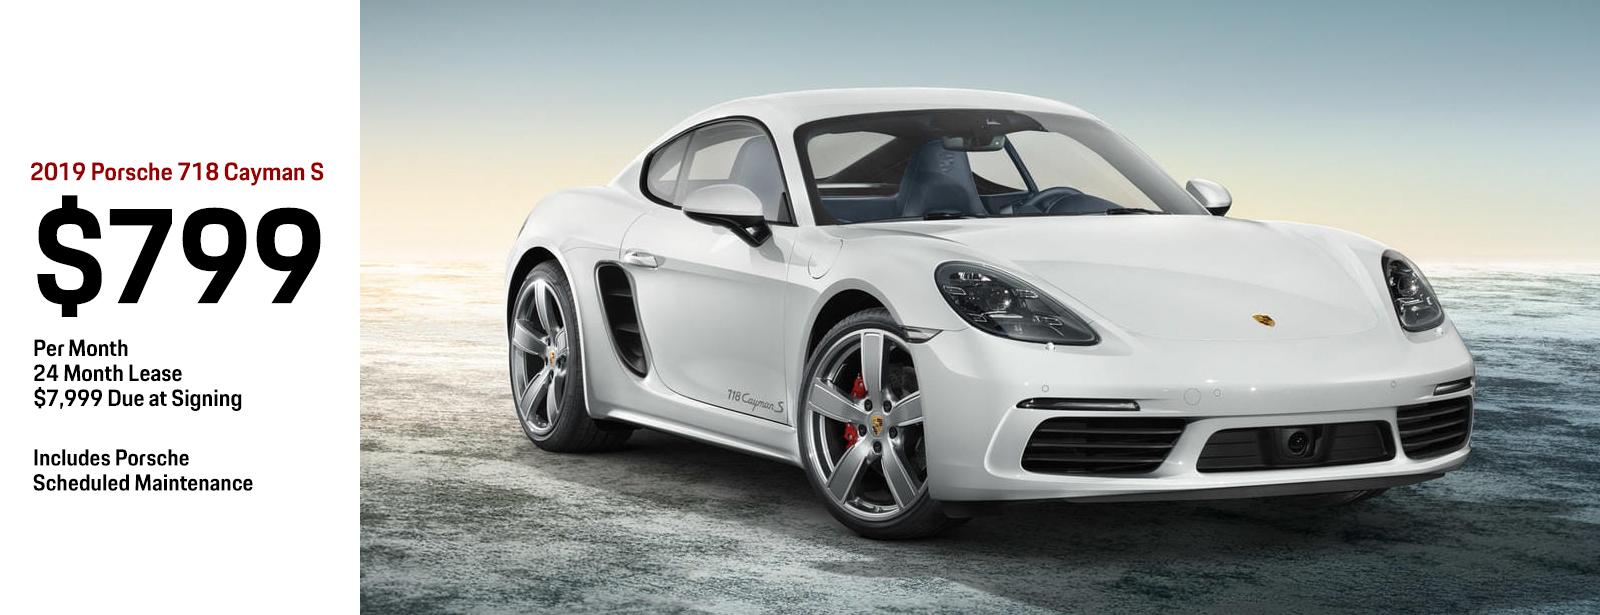 2019 Porsche 718 Cayman S Lease Special in Chandler, AZ